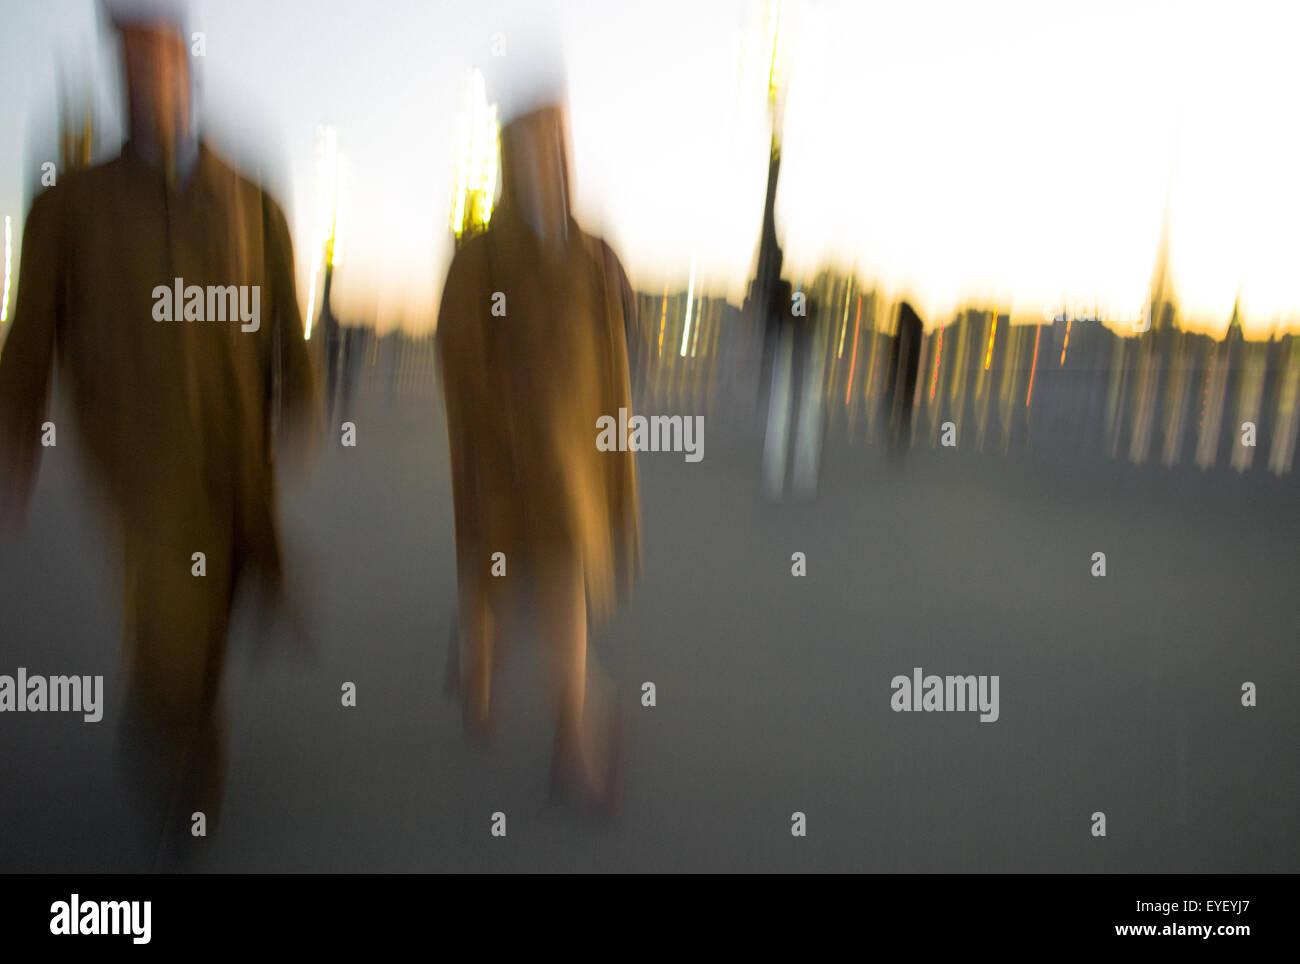 15/10/2011 - Sylvain Leser - Stock Image